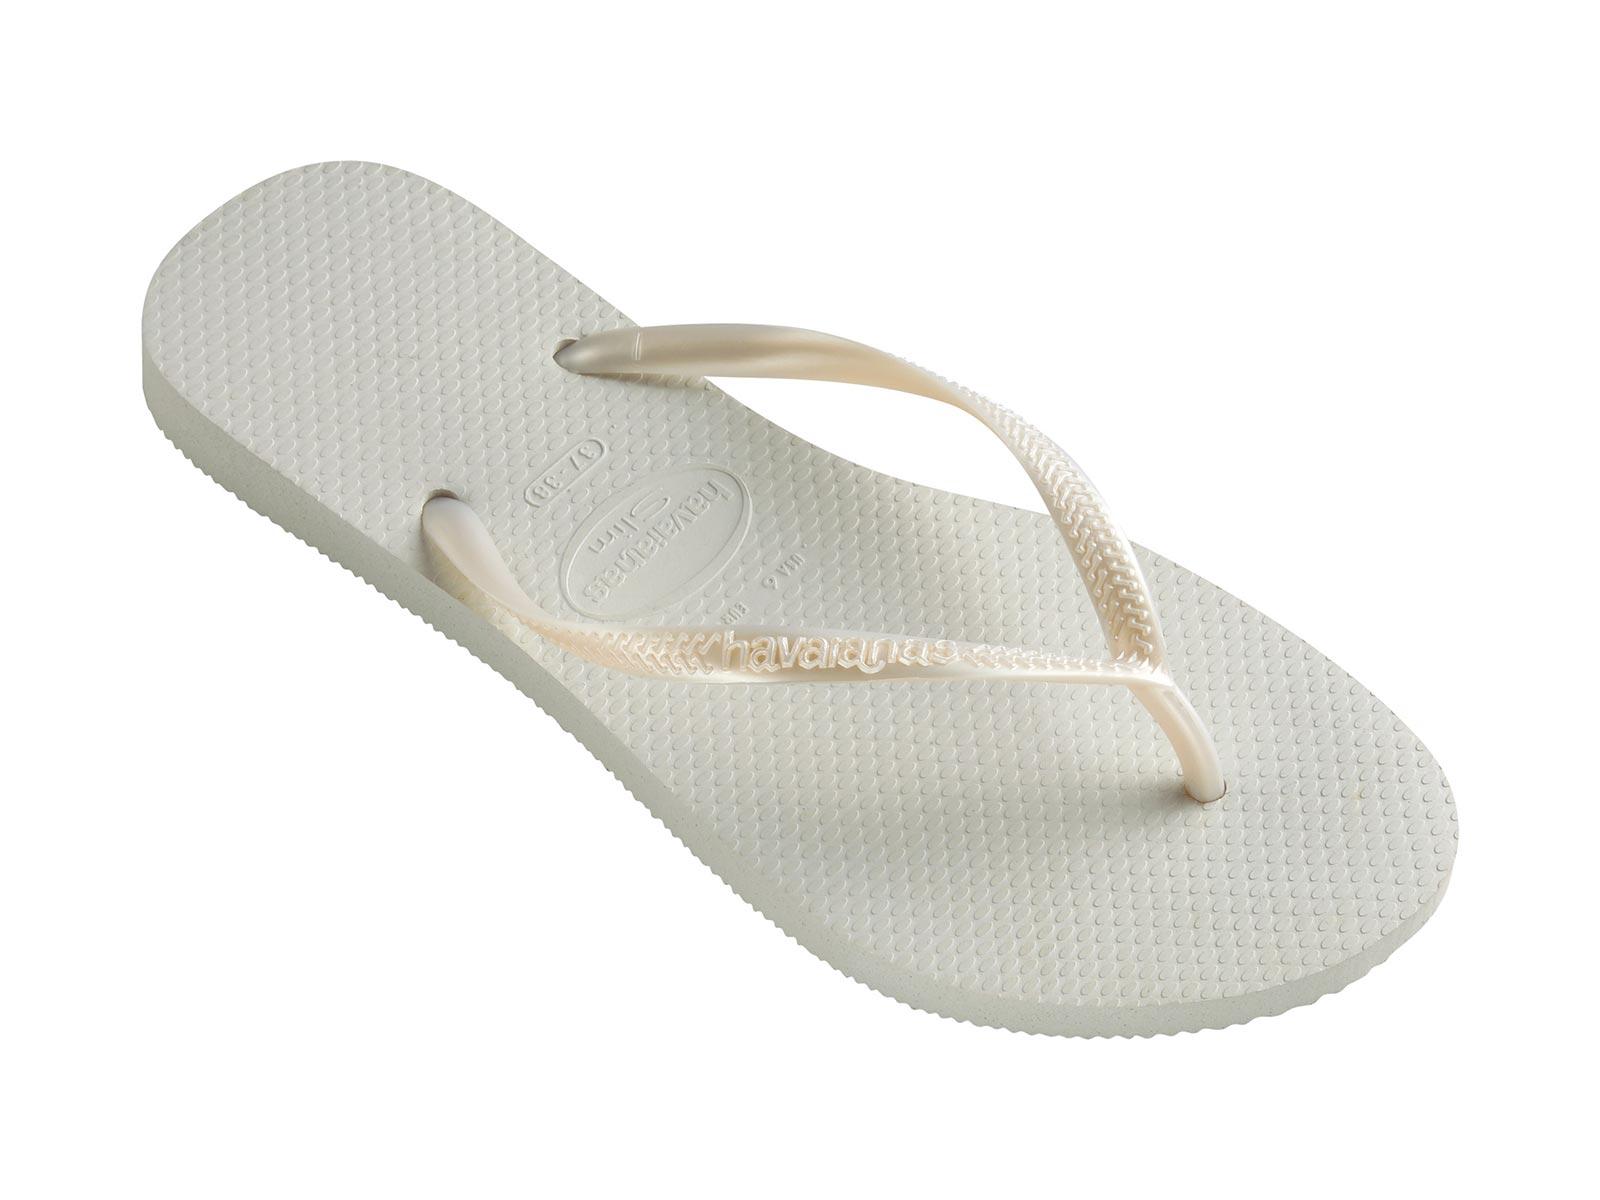 f9cc01ecc42144 Flip-Flops Flip-flops - Slim White - Brand Havaianas